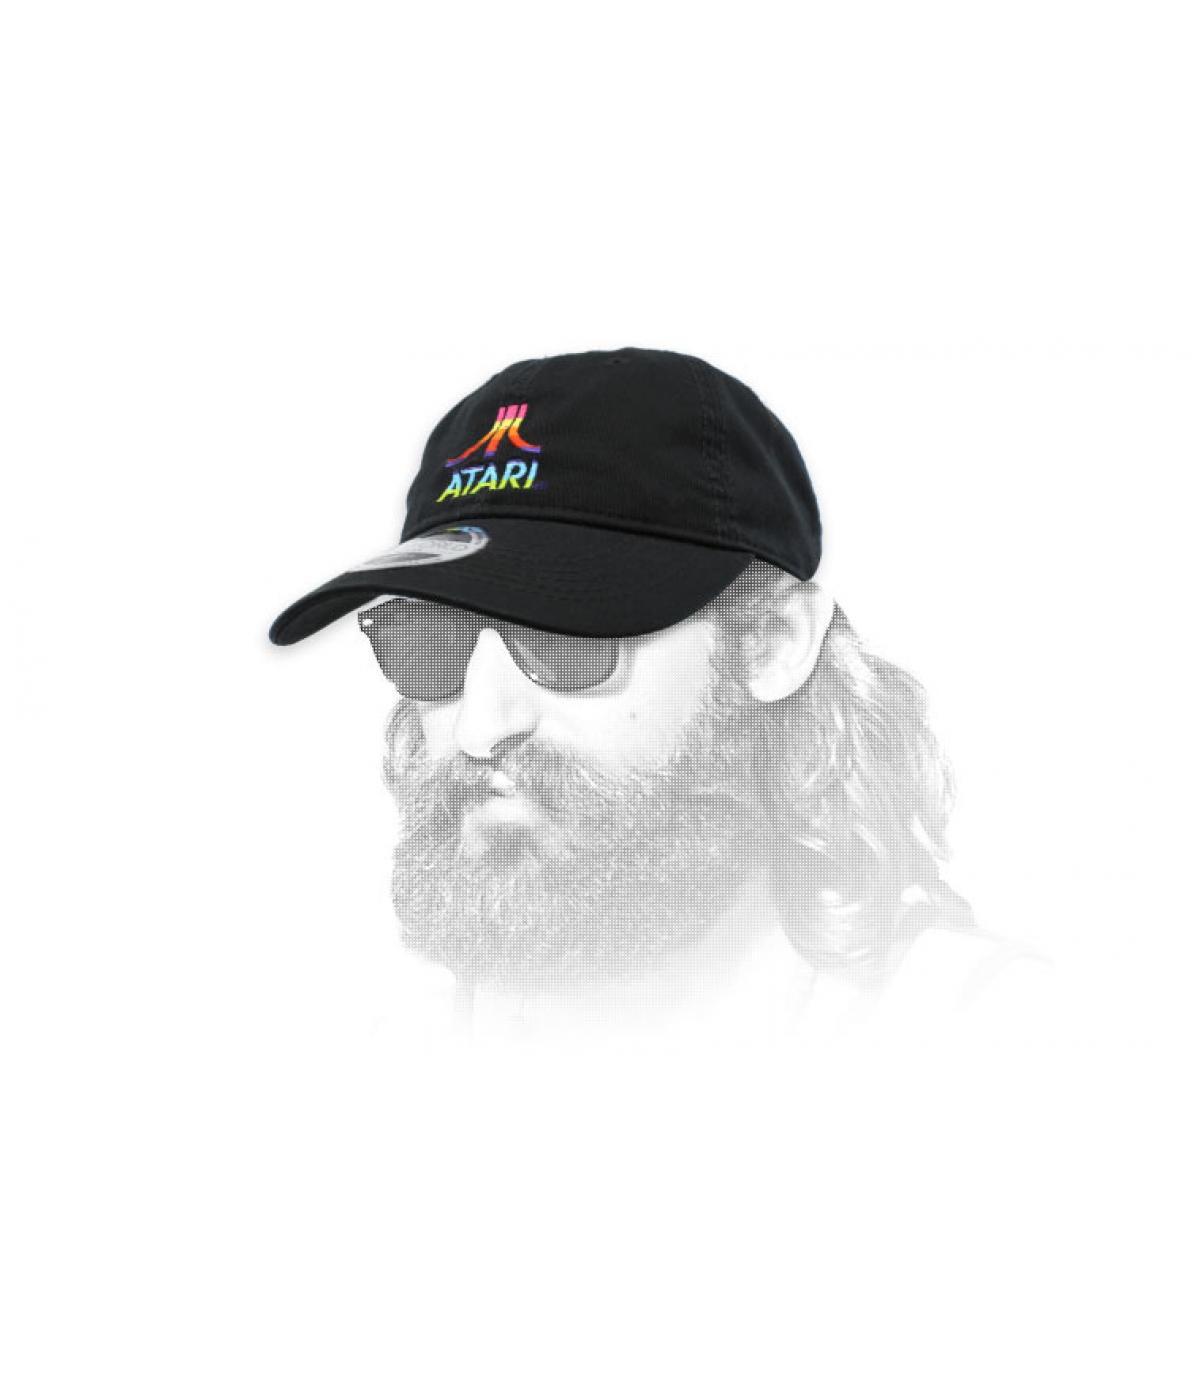 gorra Atari logo